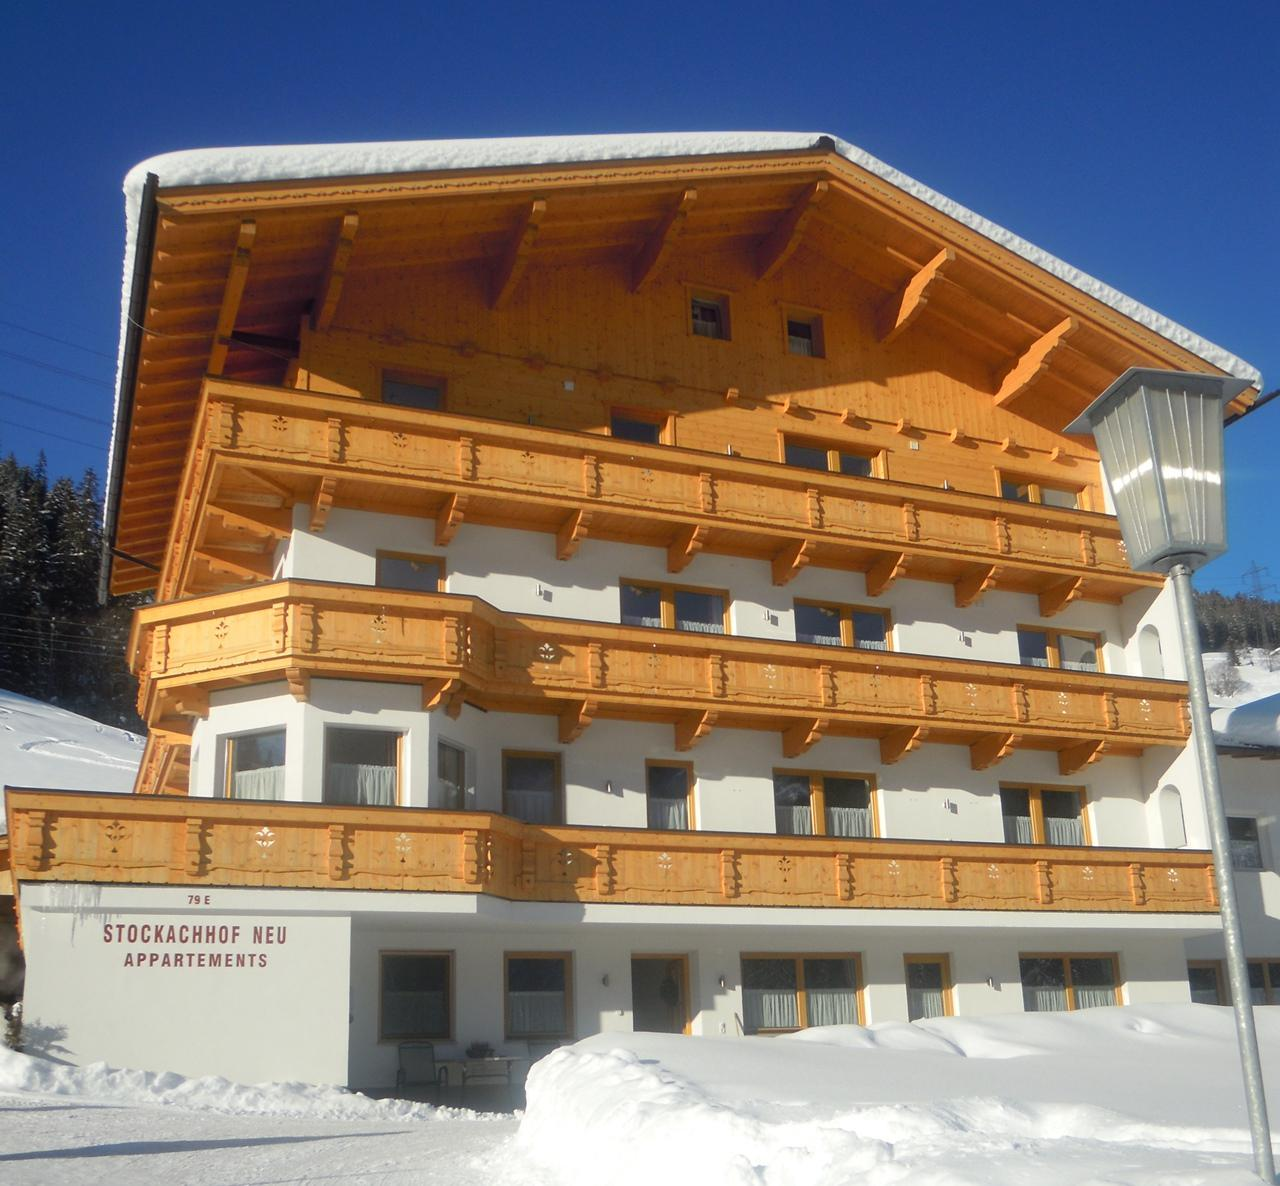 Appartementen Neustockach